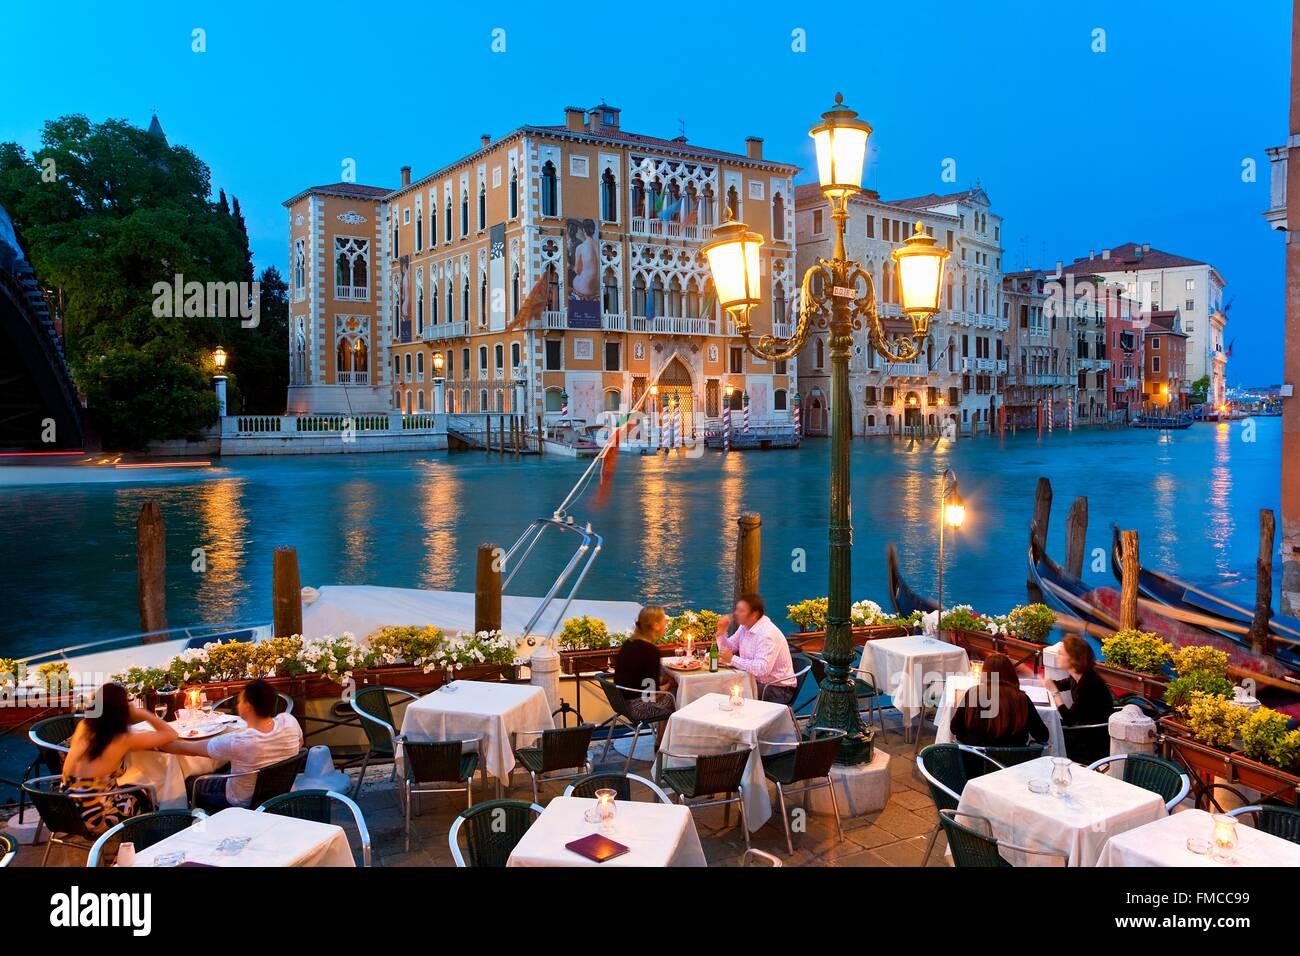 Italy, Veneto, Venice, Restaurant and Terrace along Grand Canal - Stock Image